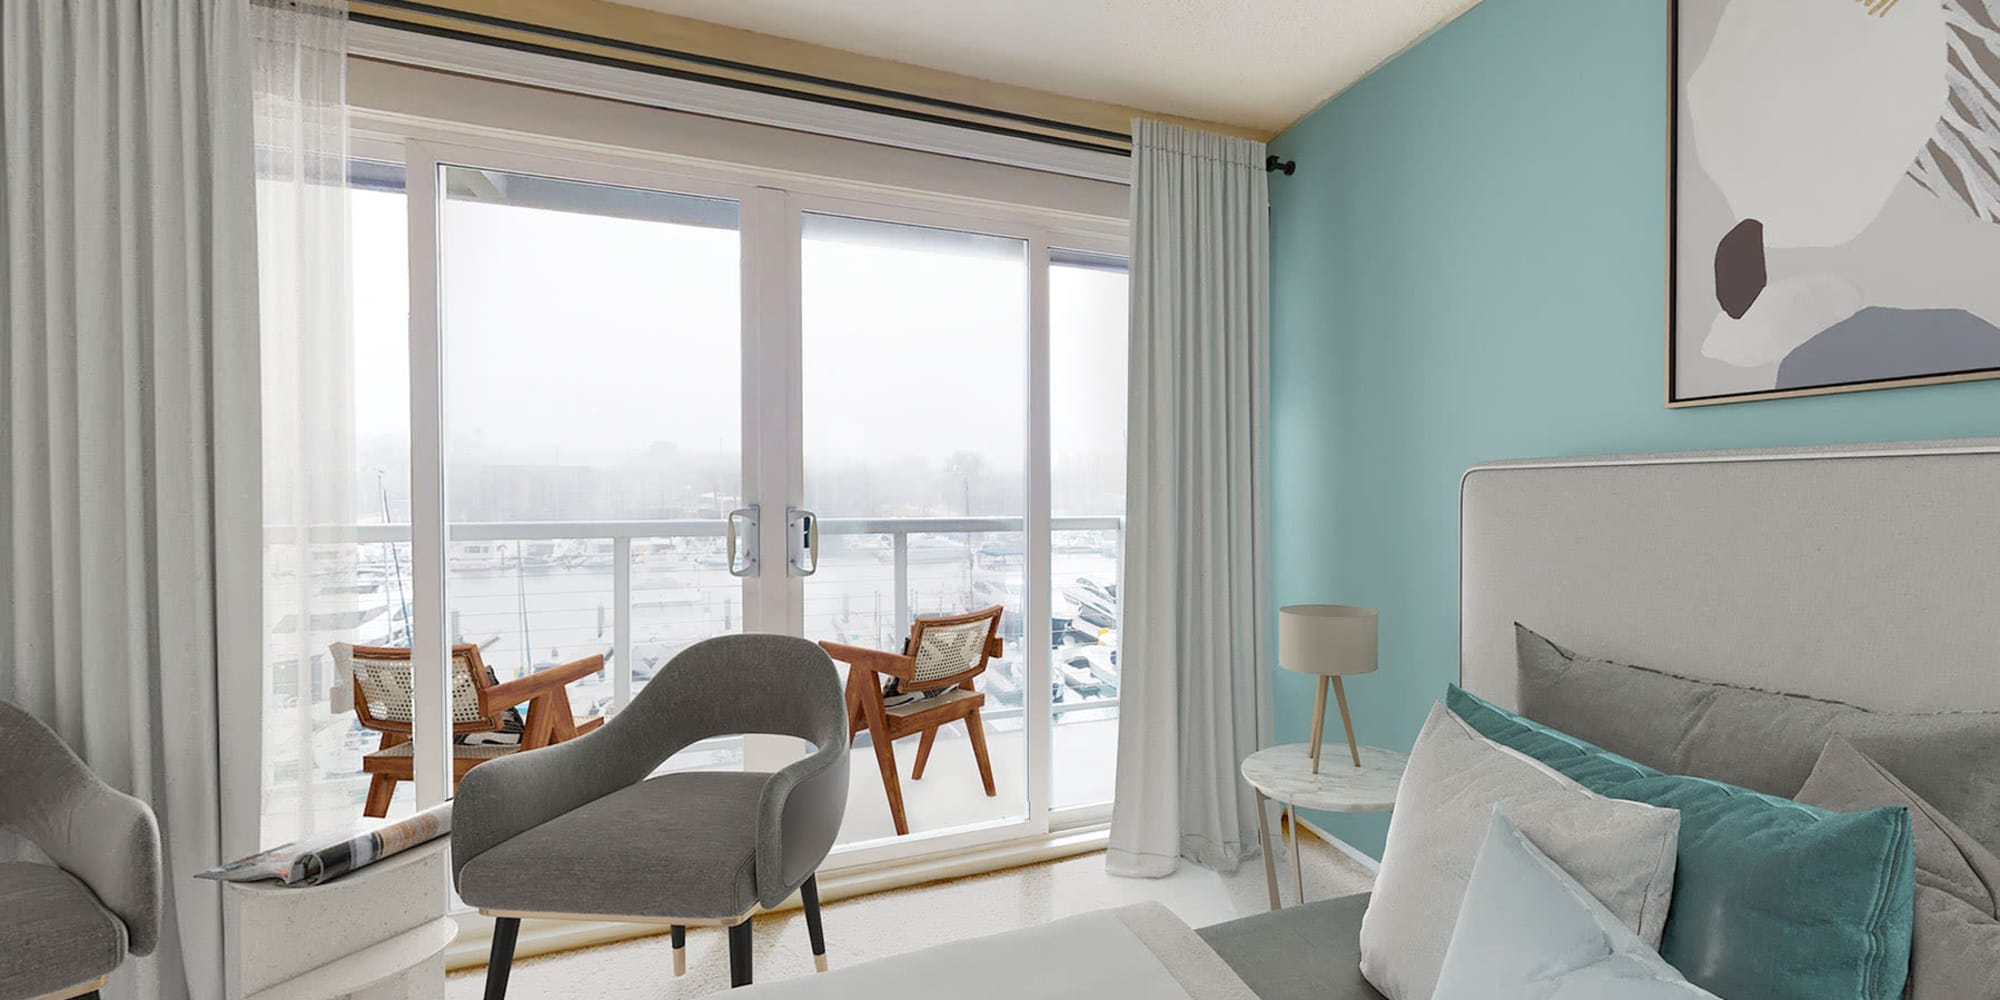 Spacious bedroom with balcony and waterfront views of the marina at The Tides at Marina Harbor in Marina del Rey, California